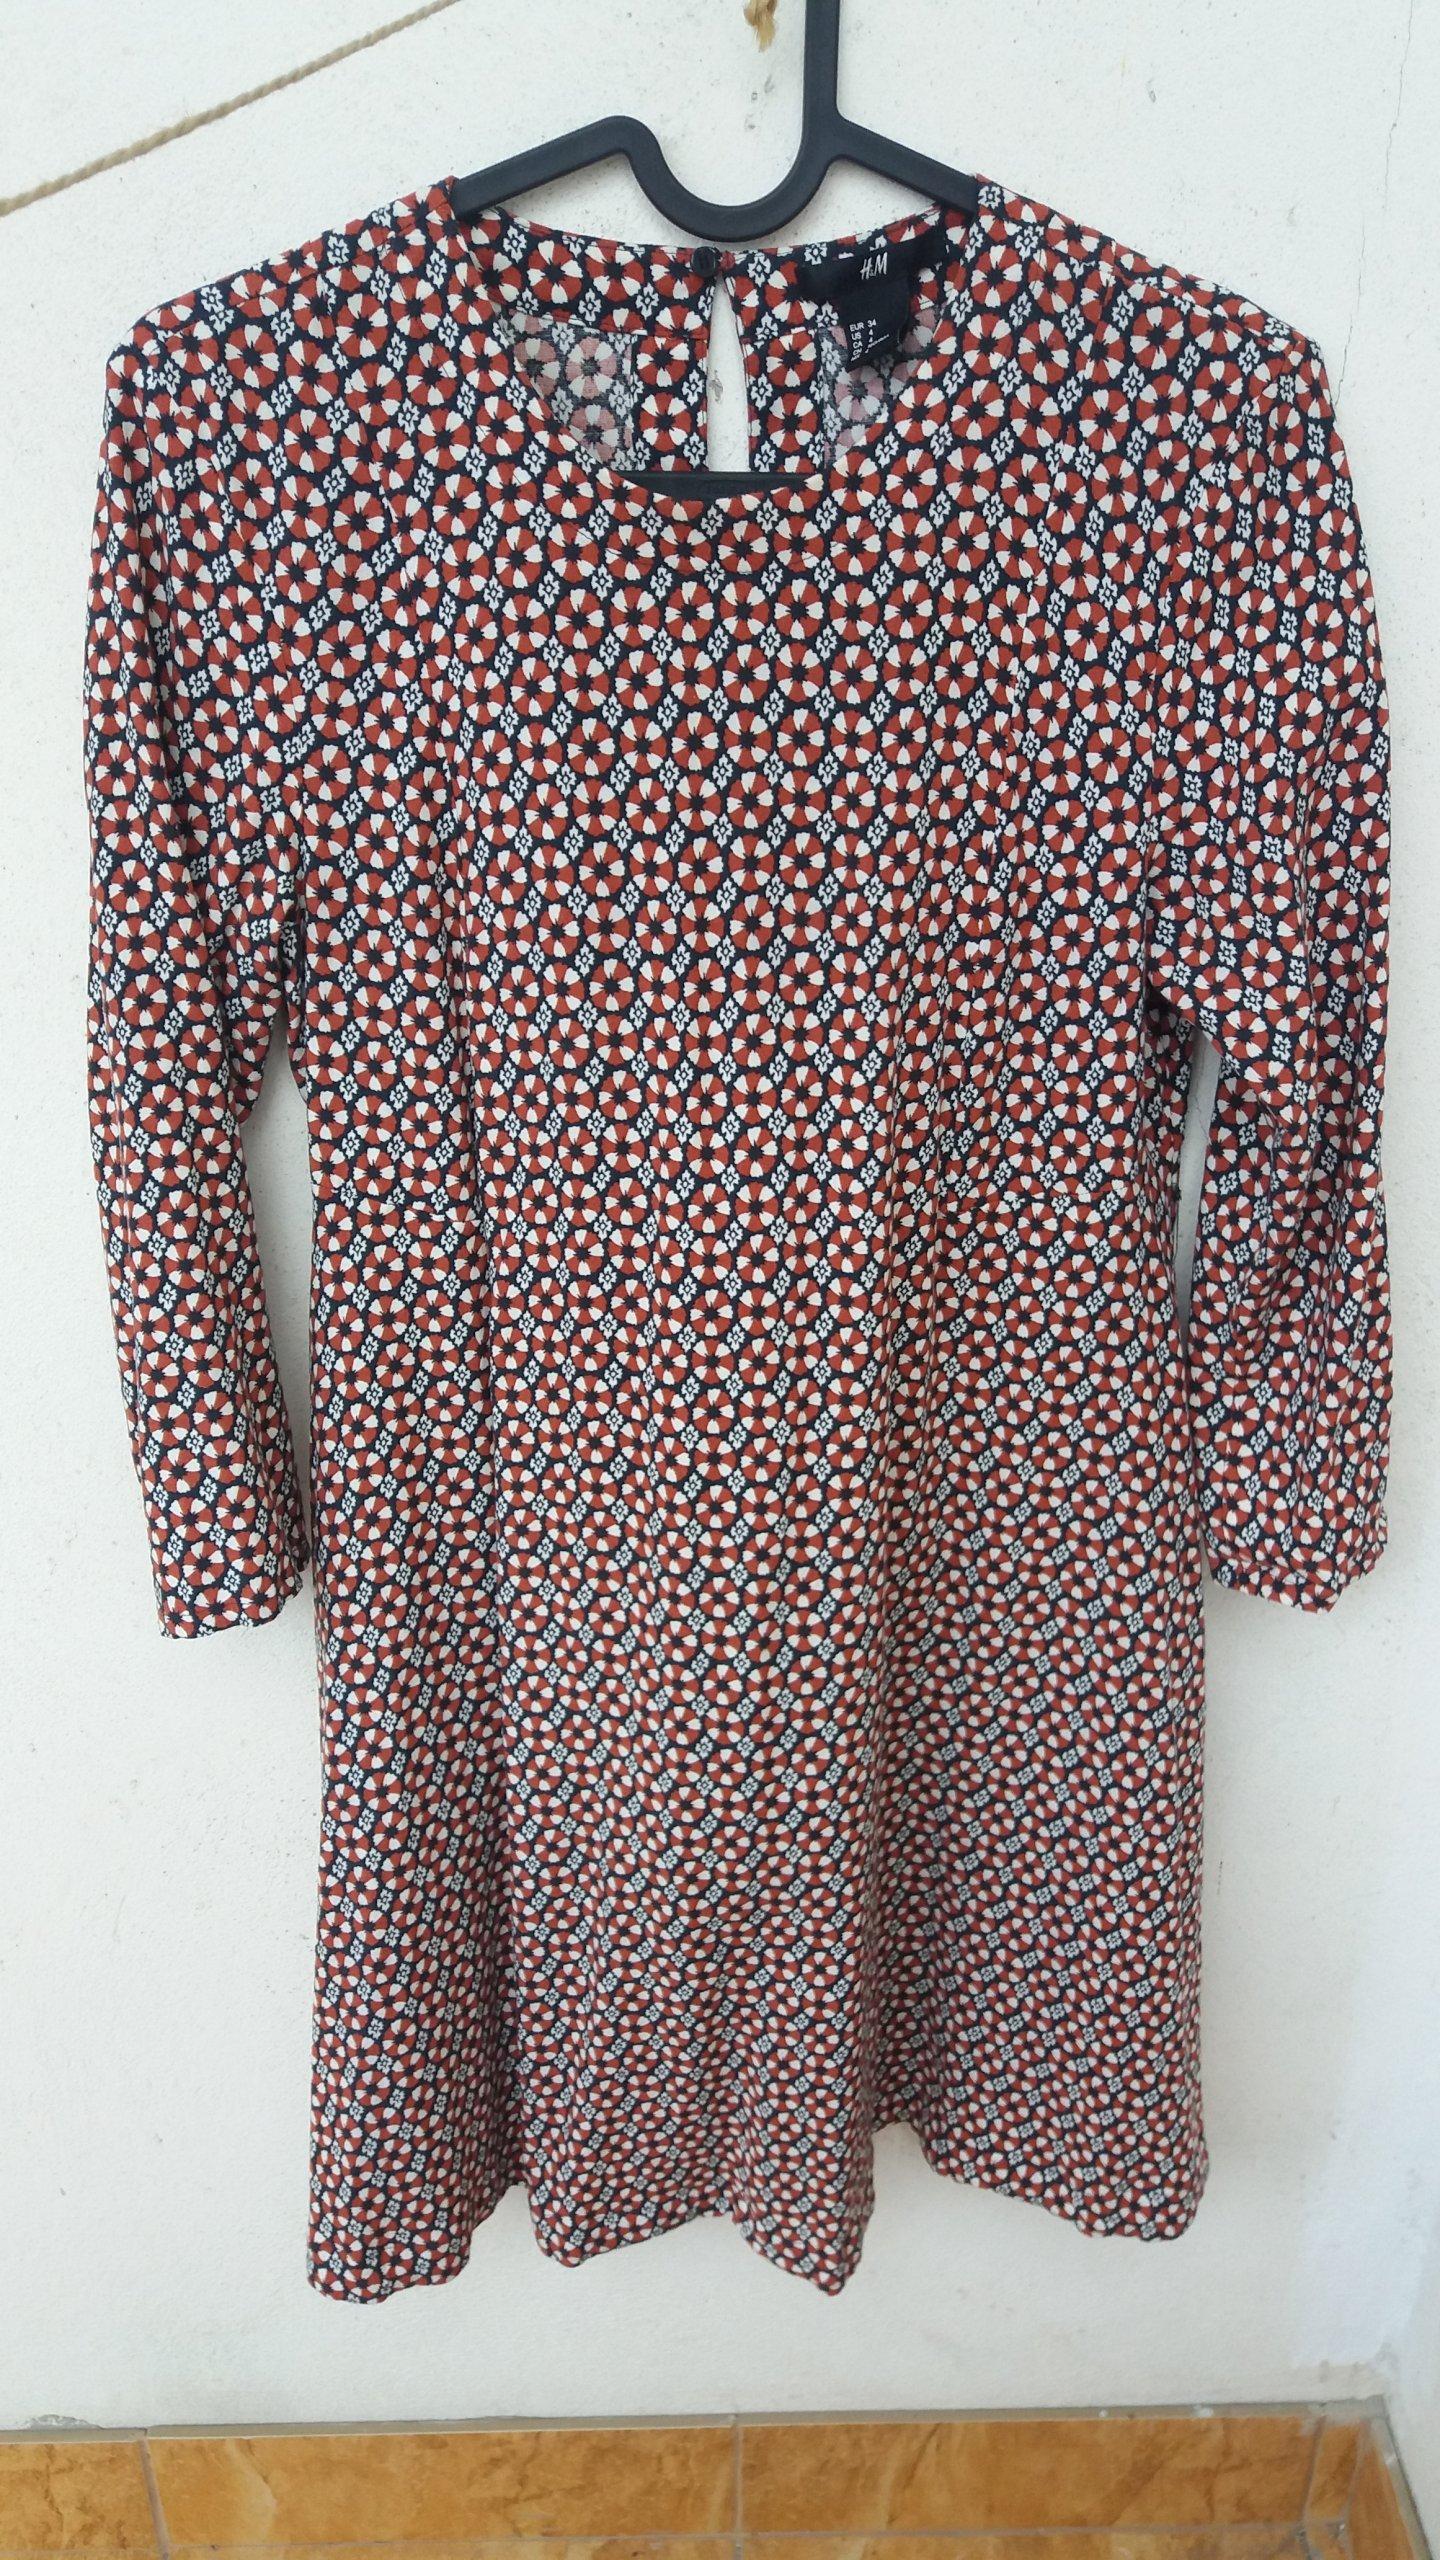 sukienka H M 34 vintage retro - 7214953732 - oficjalne archiwum allegro 528931e5c8a65